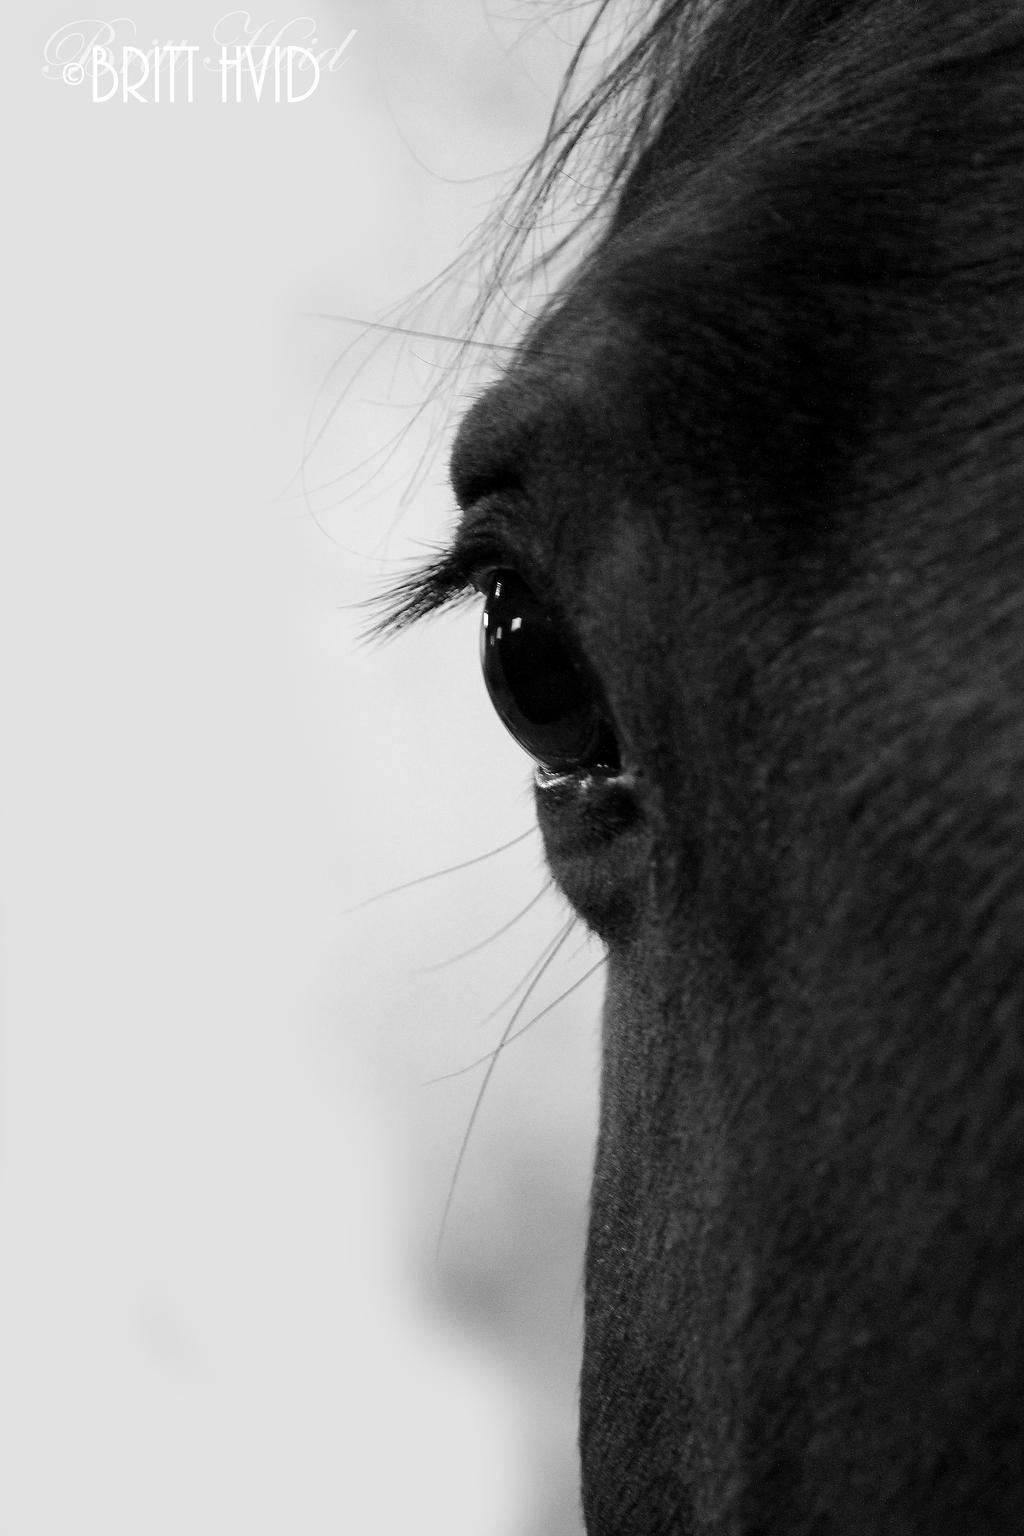 Horse's eye by BHvid